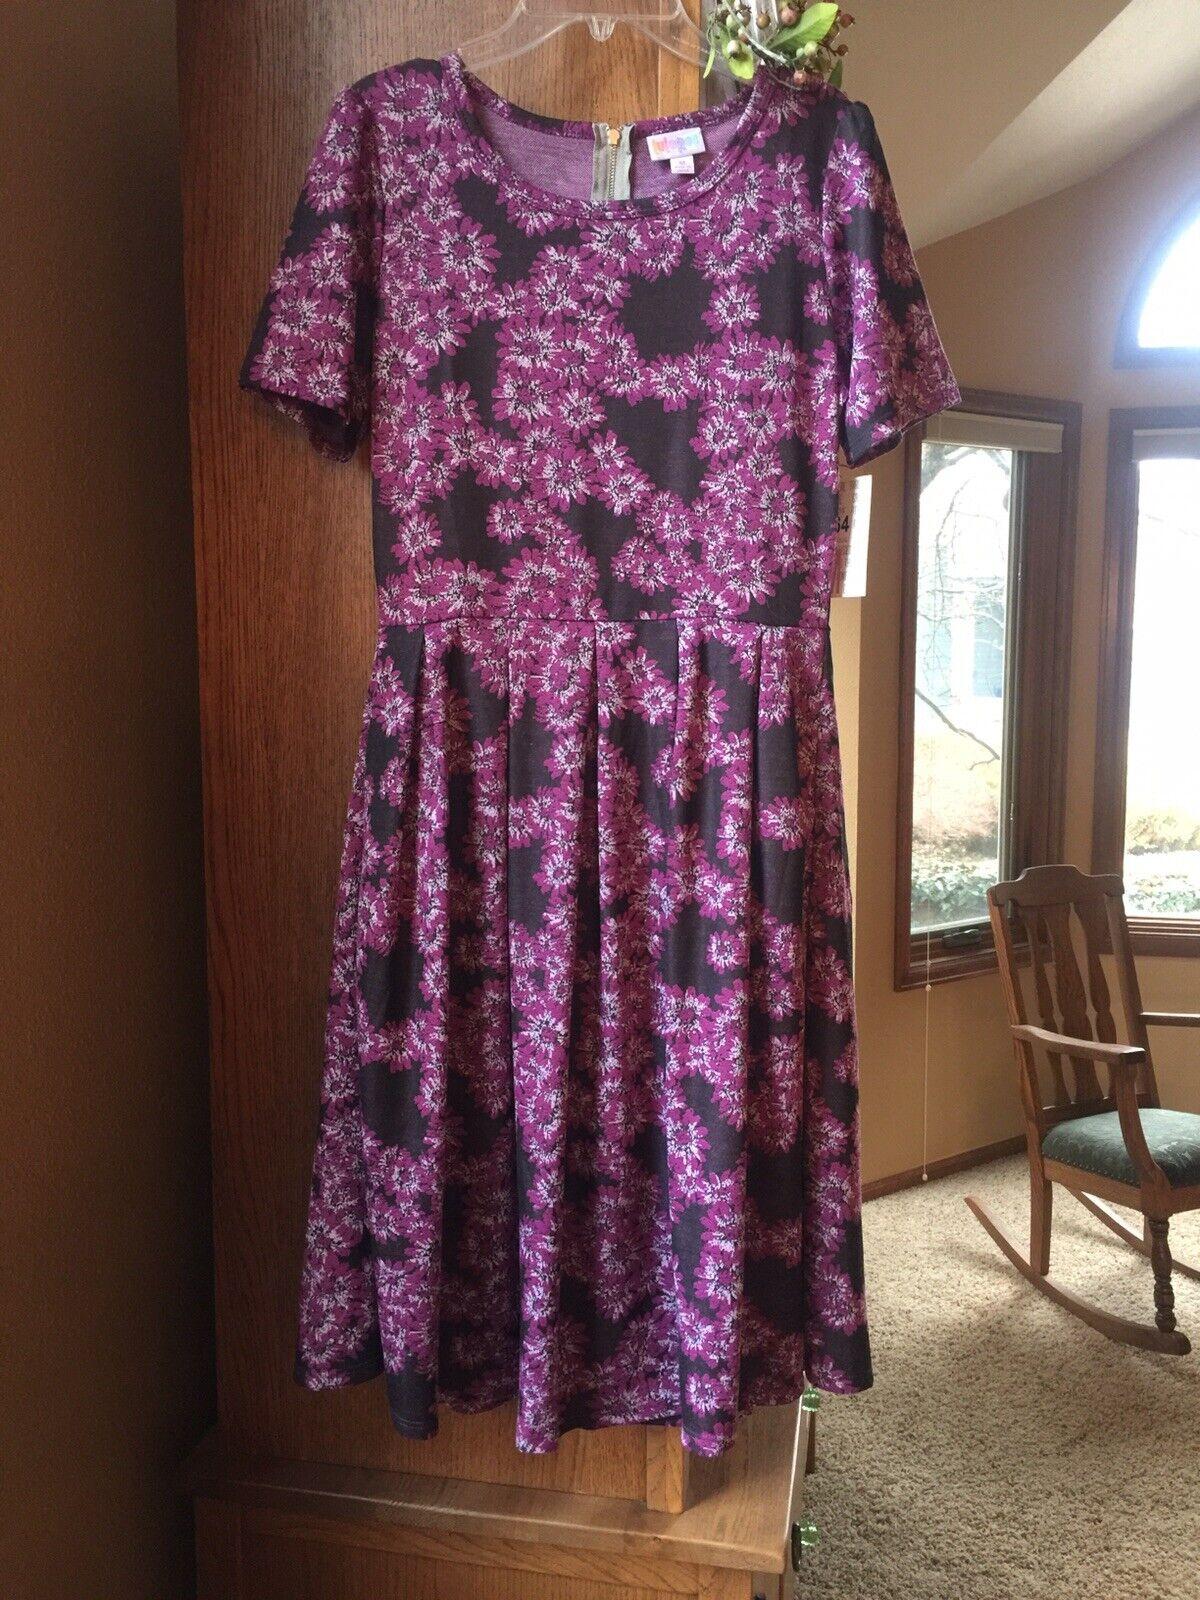 Perfect EASTER dress  LuLaRoe Amelia Medium M lila lavender floral dress NWT